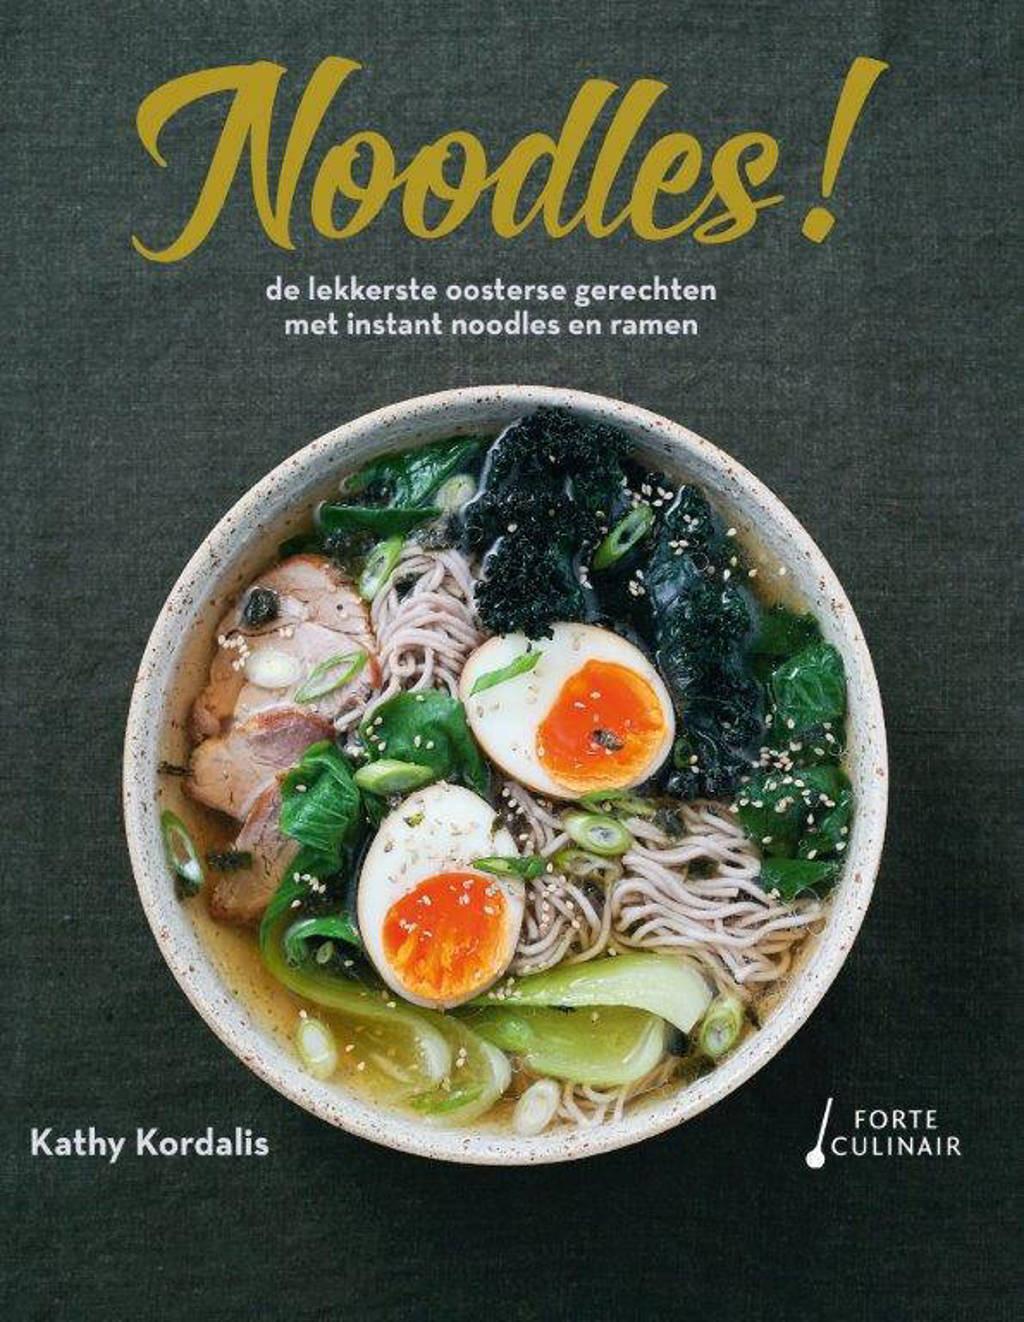 Noodles! - Kathy Kordalis